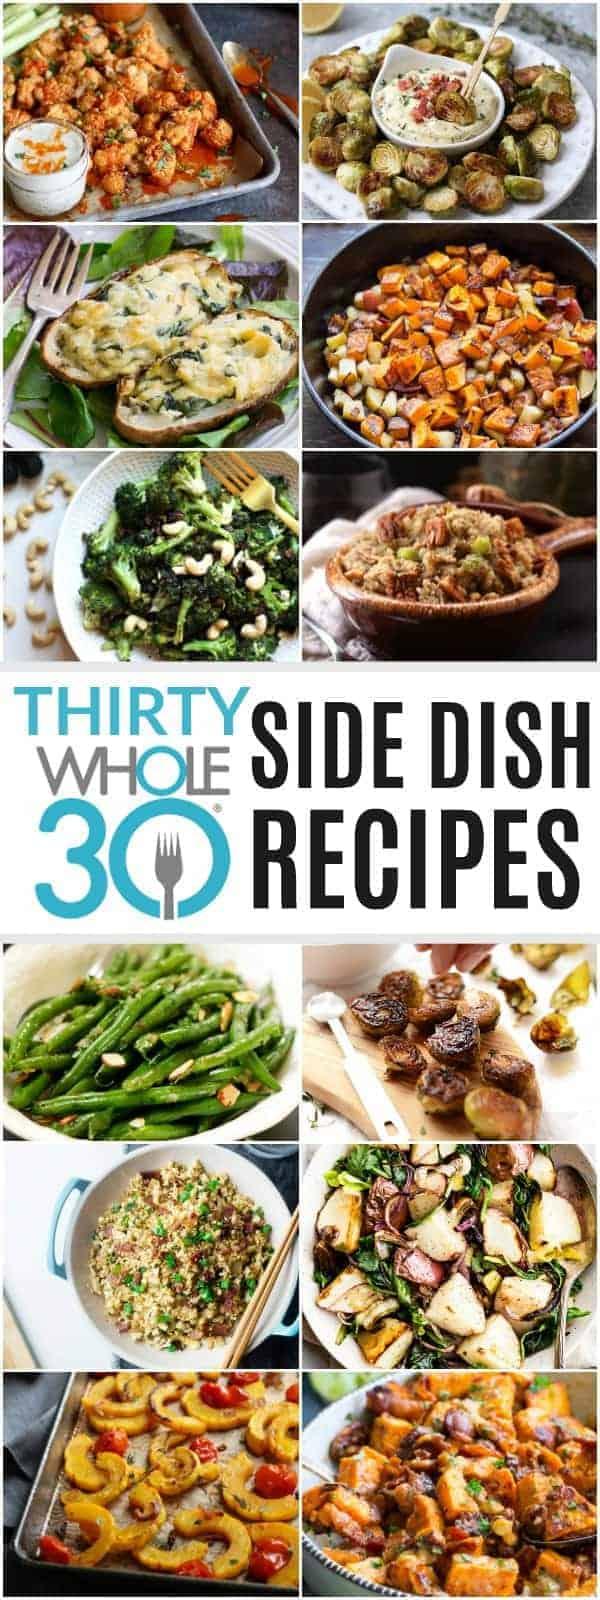 30 Whole30 Side Dish Recipes pin